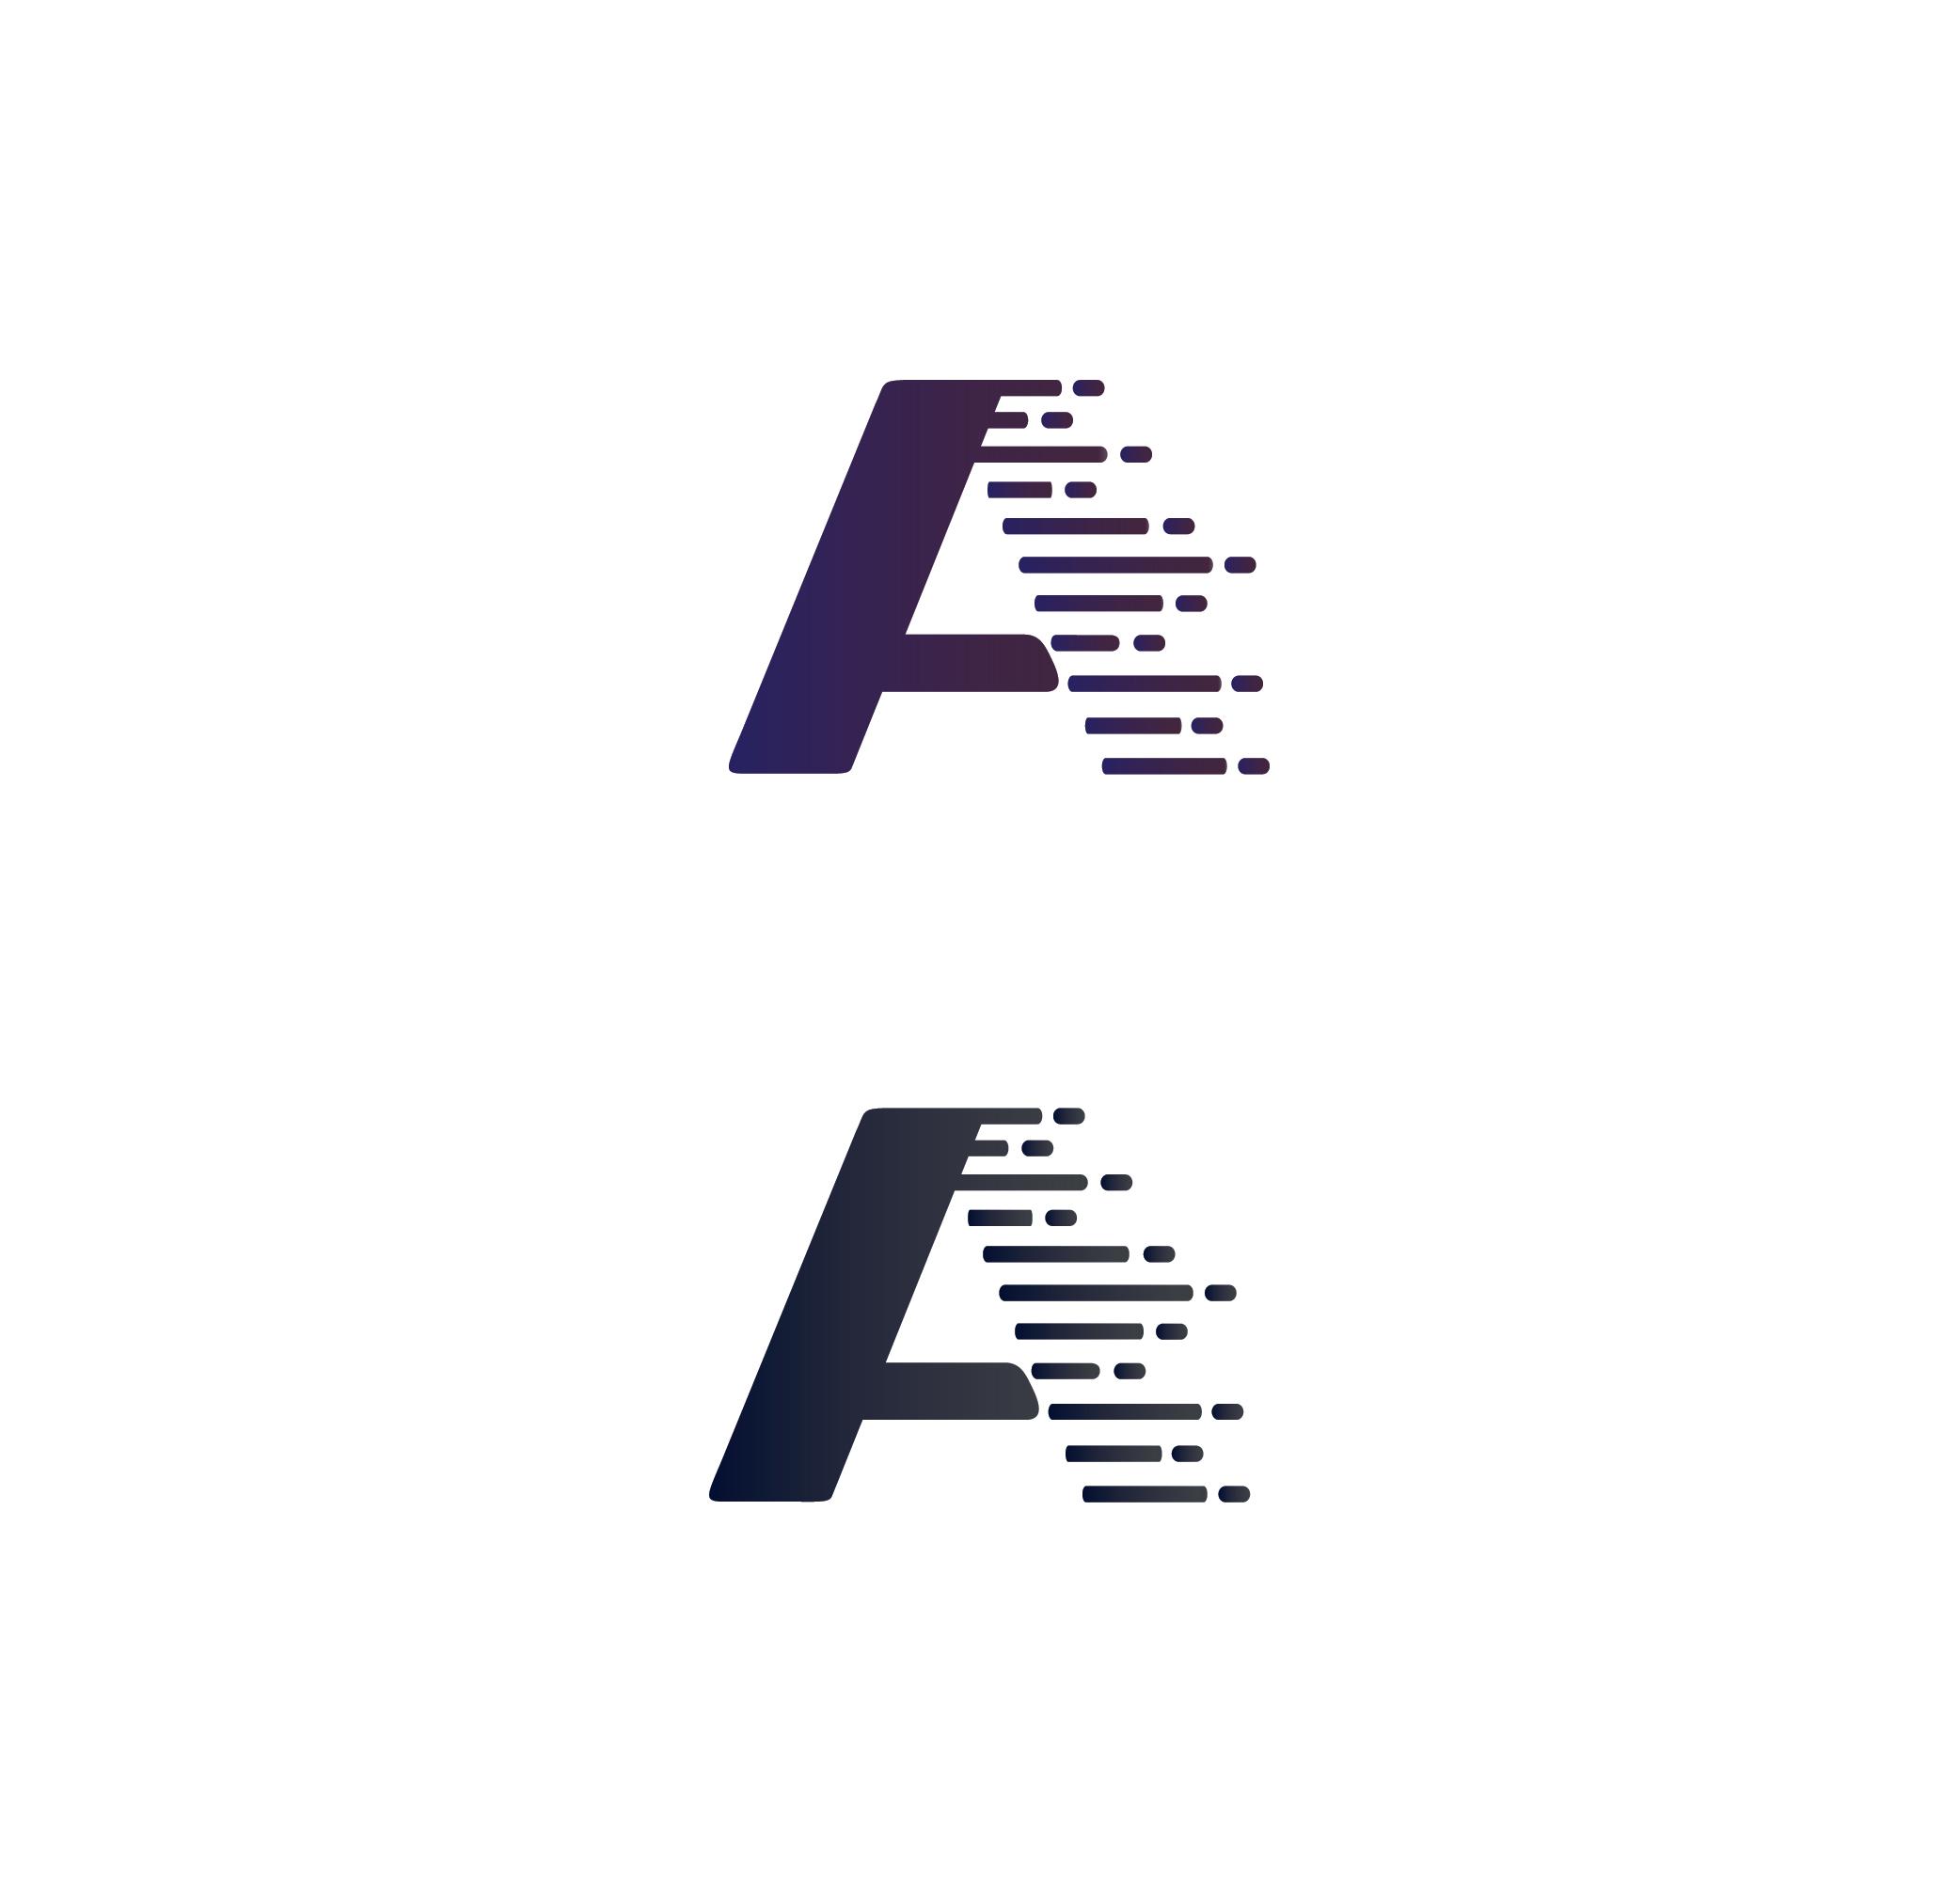 Дизайнер для разработки логотипа компании фото f_3225bf69260224e8.jpg